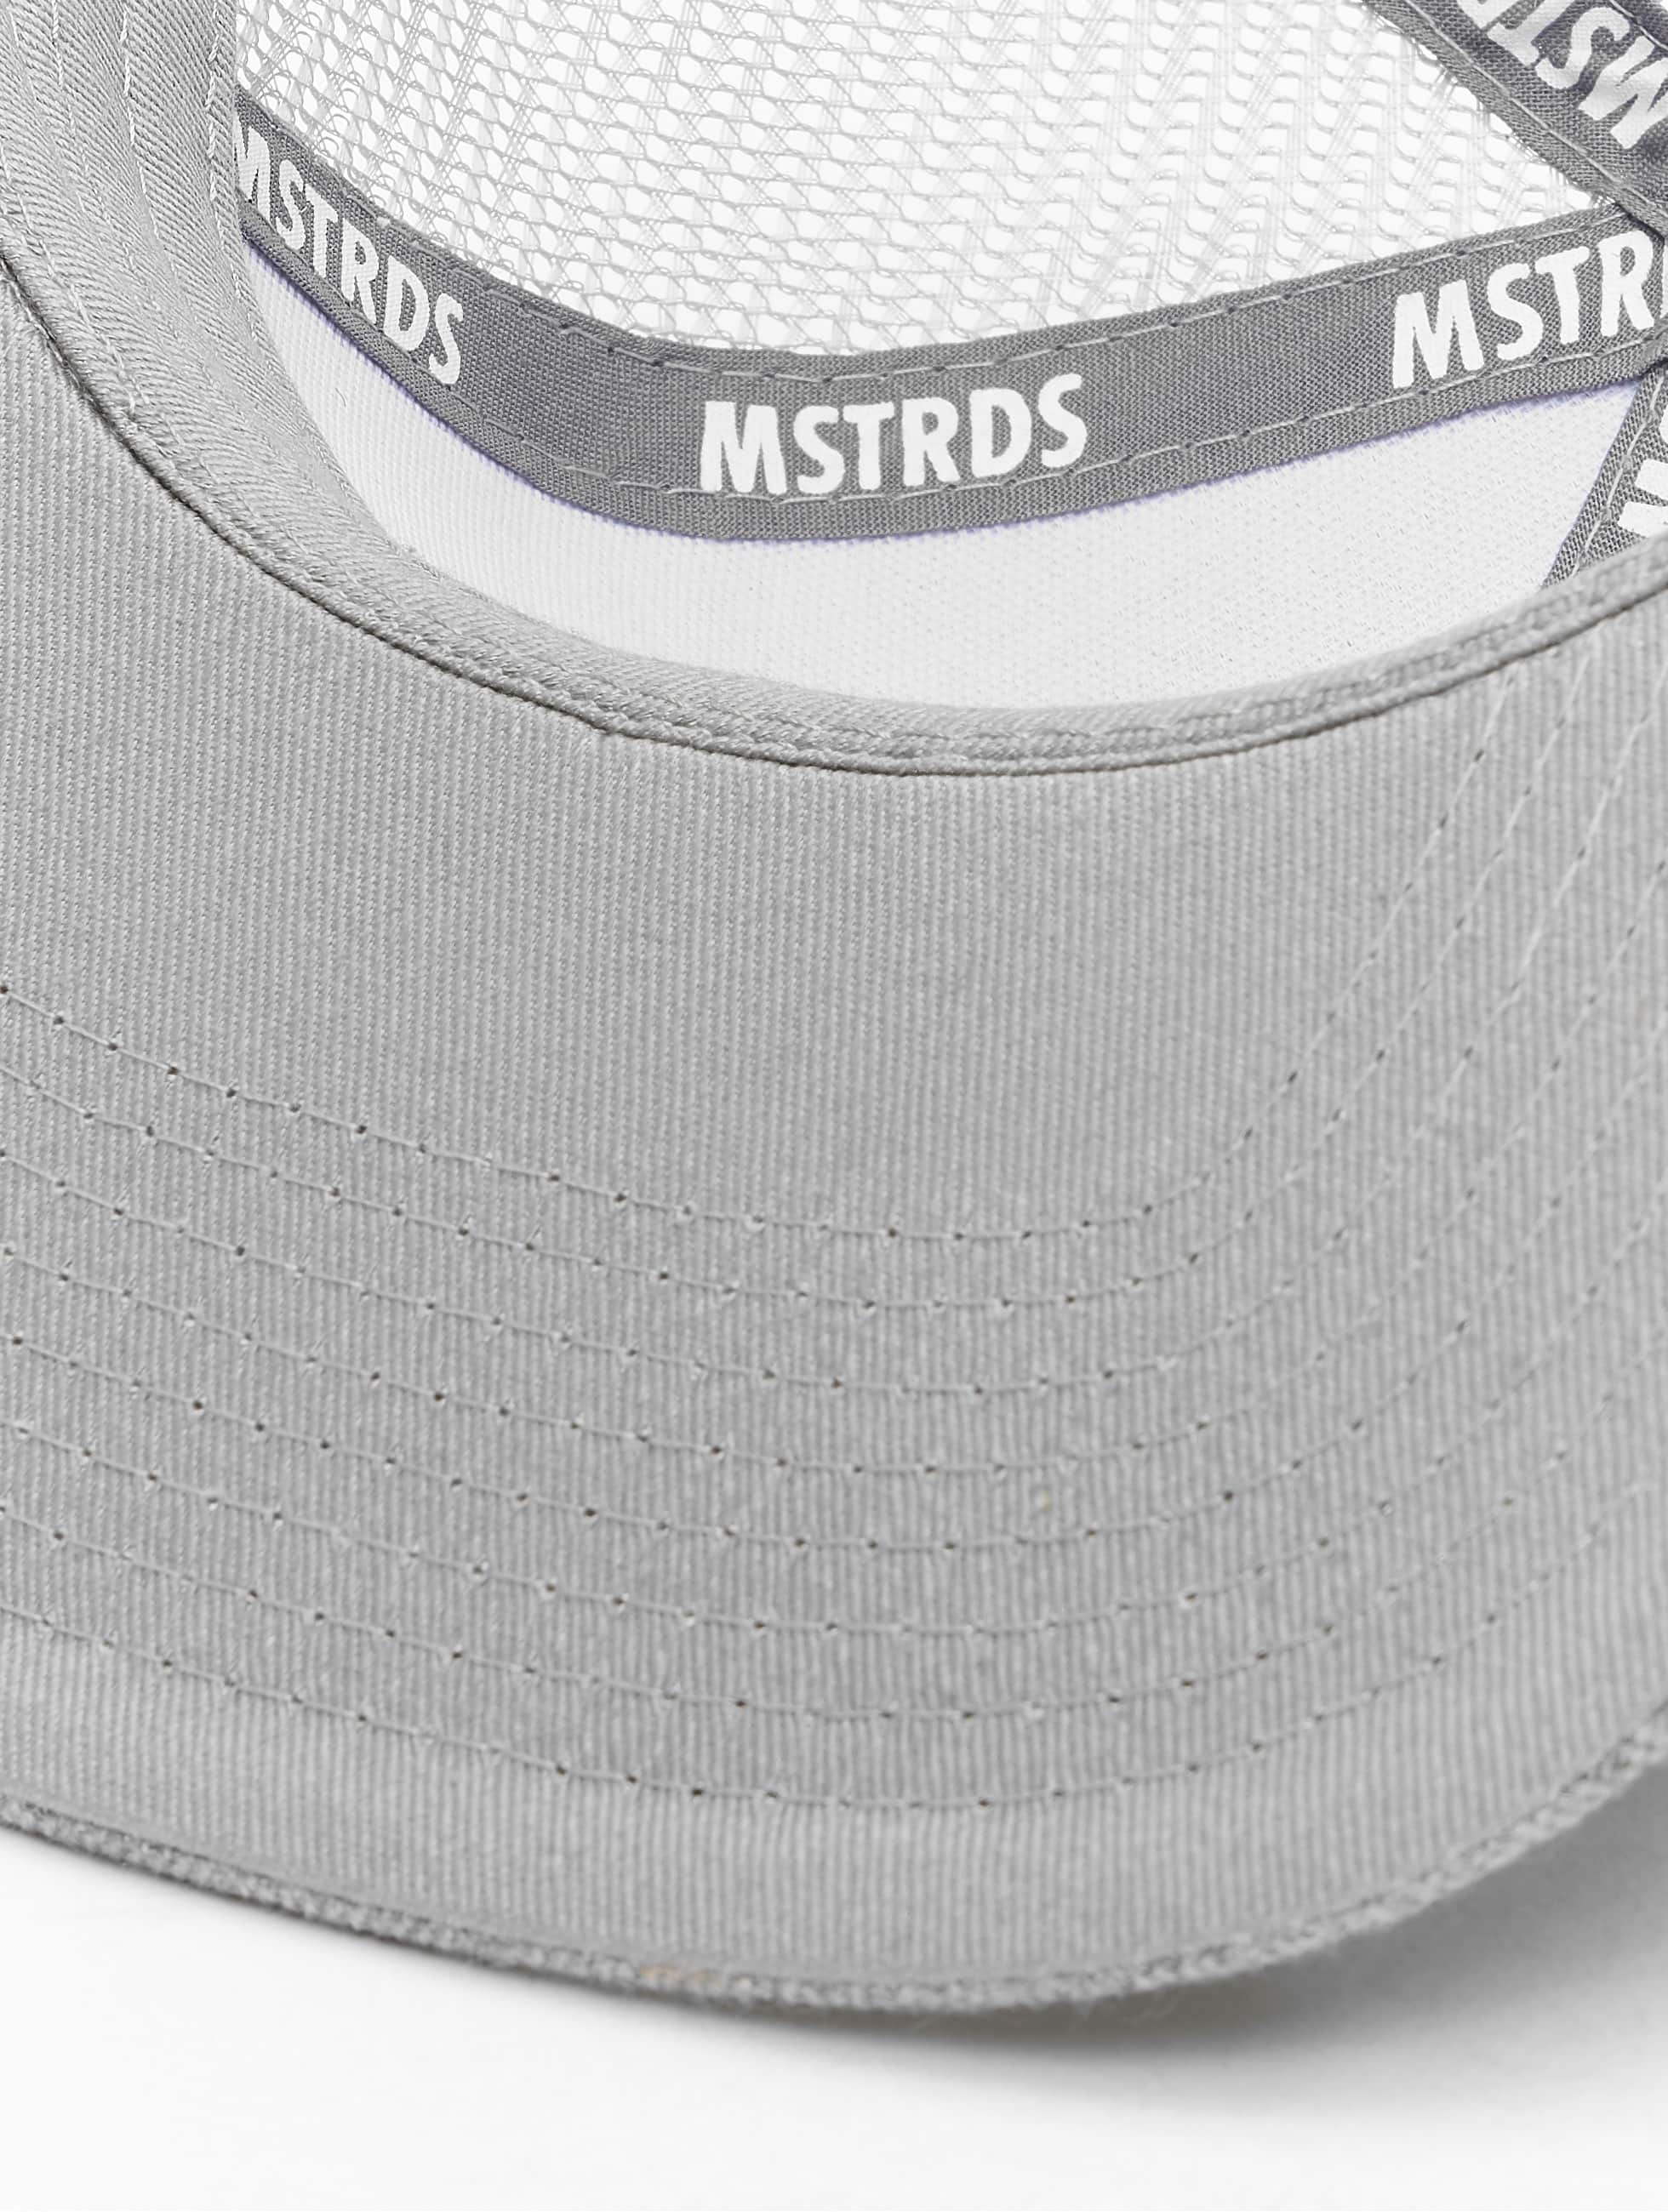 MSTRDS trucker cap Money Clip grijs